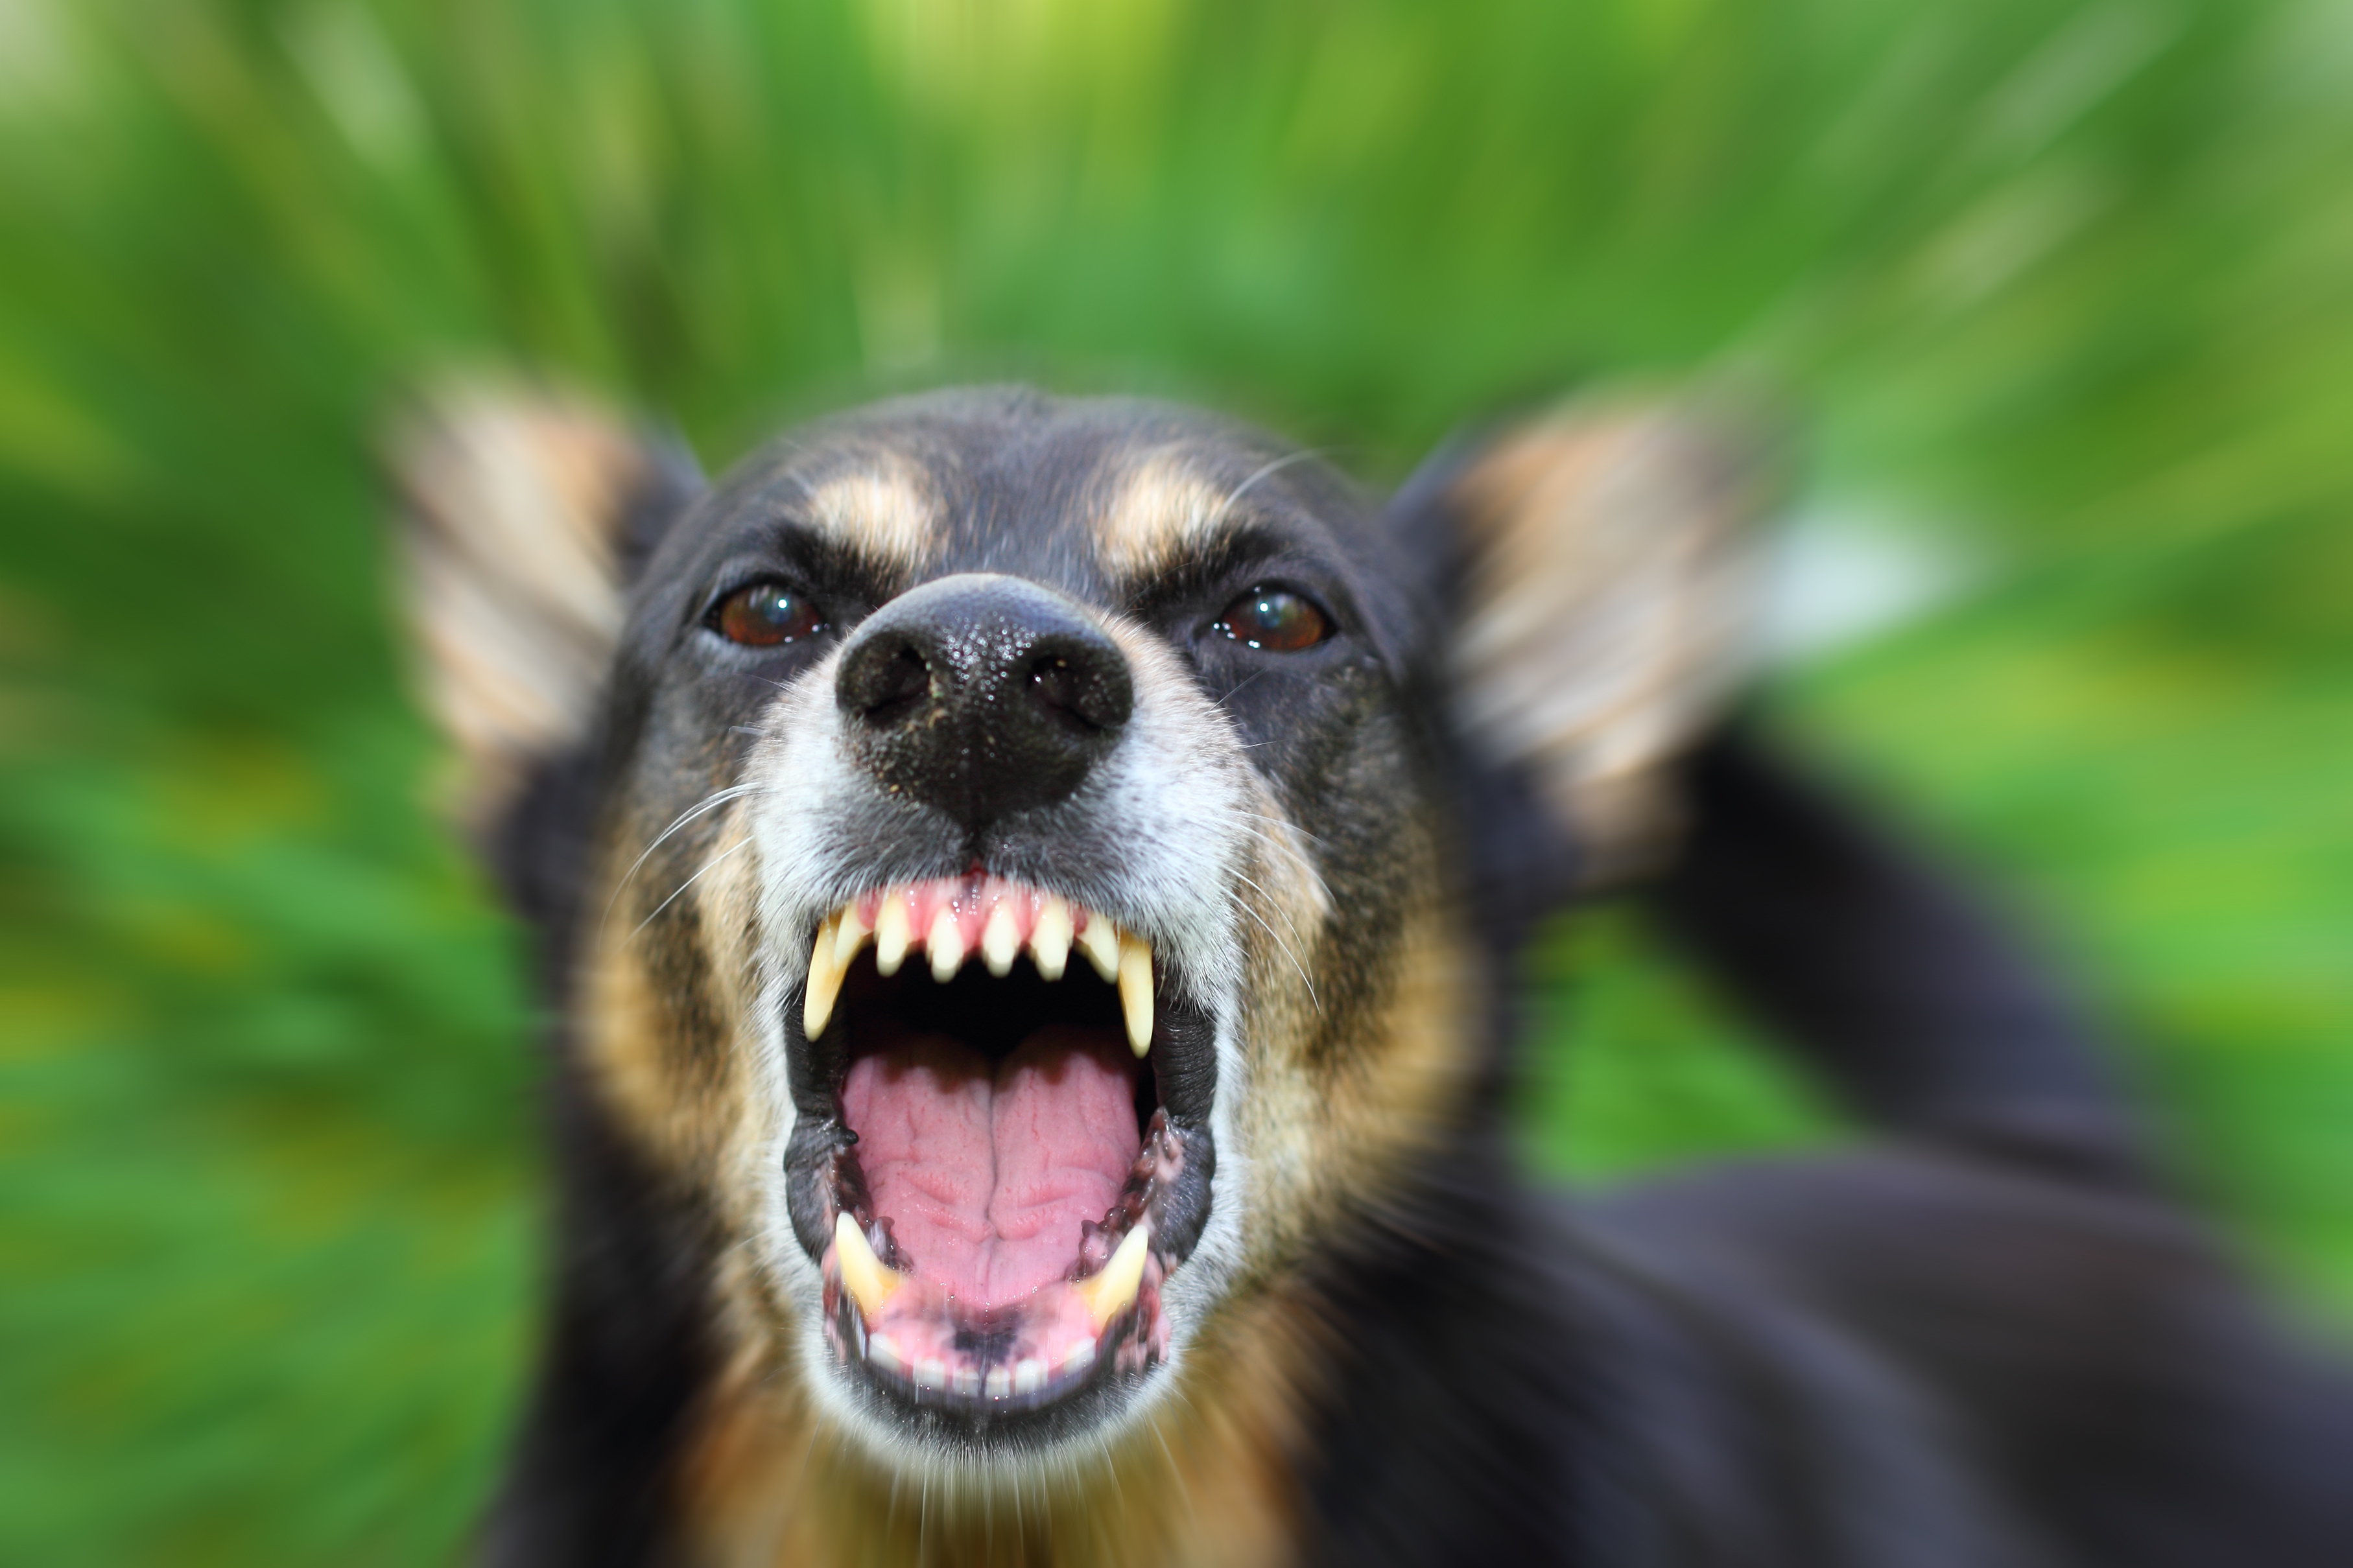 Собака напала на 9-летнюю девочку в Краснокаменске. Прокуратура начала проверку.